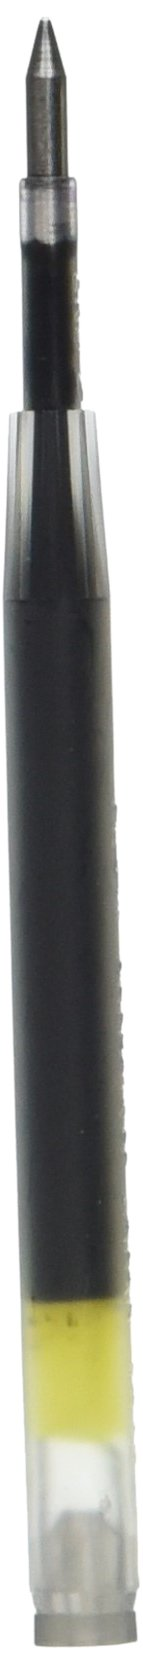 Pilot Acro Ink Refill for Dr. Grip G-Spec, Black Ink...